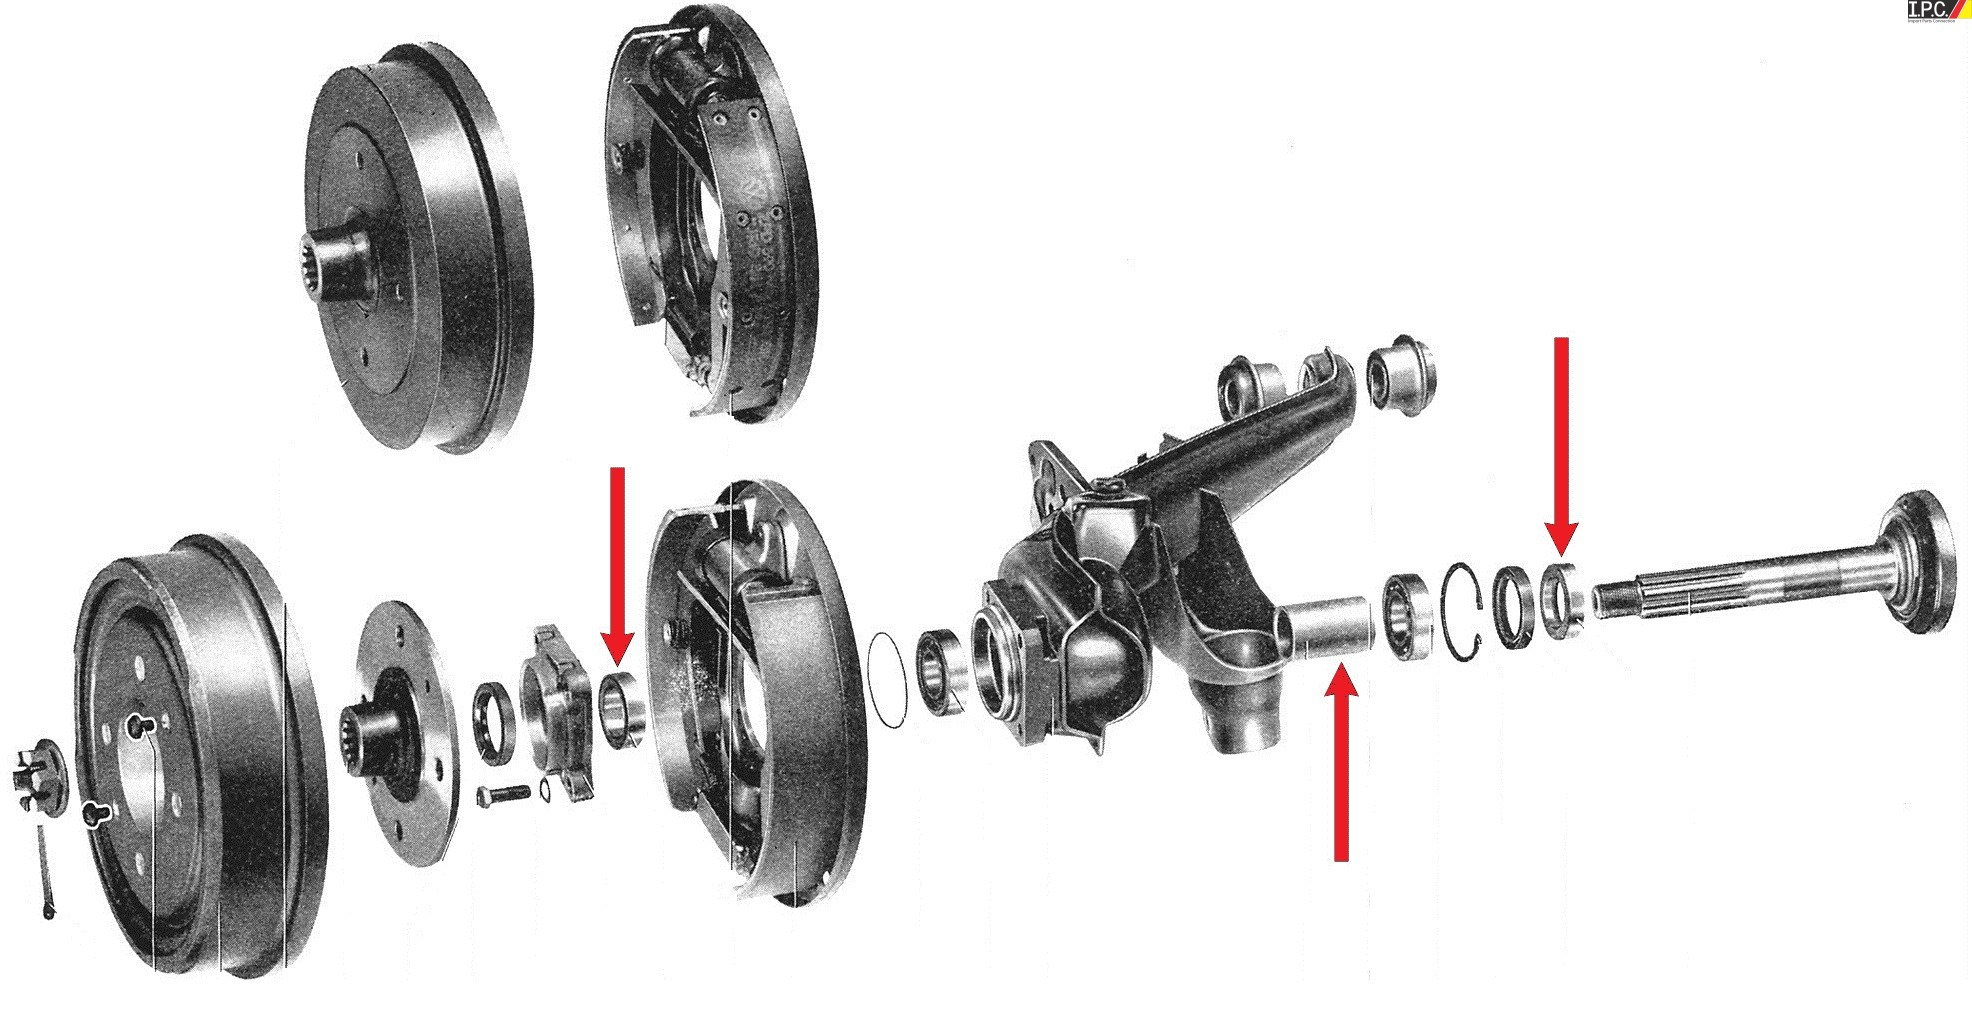 Empi High Performance Axle Spacer Kits I P C Vw Parts Vw